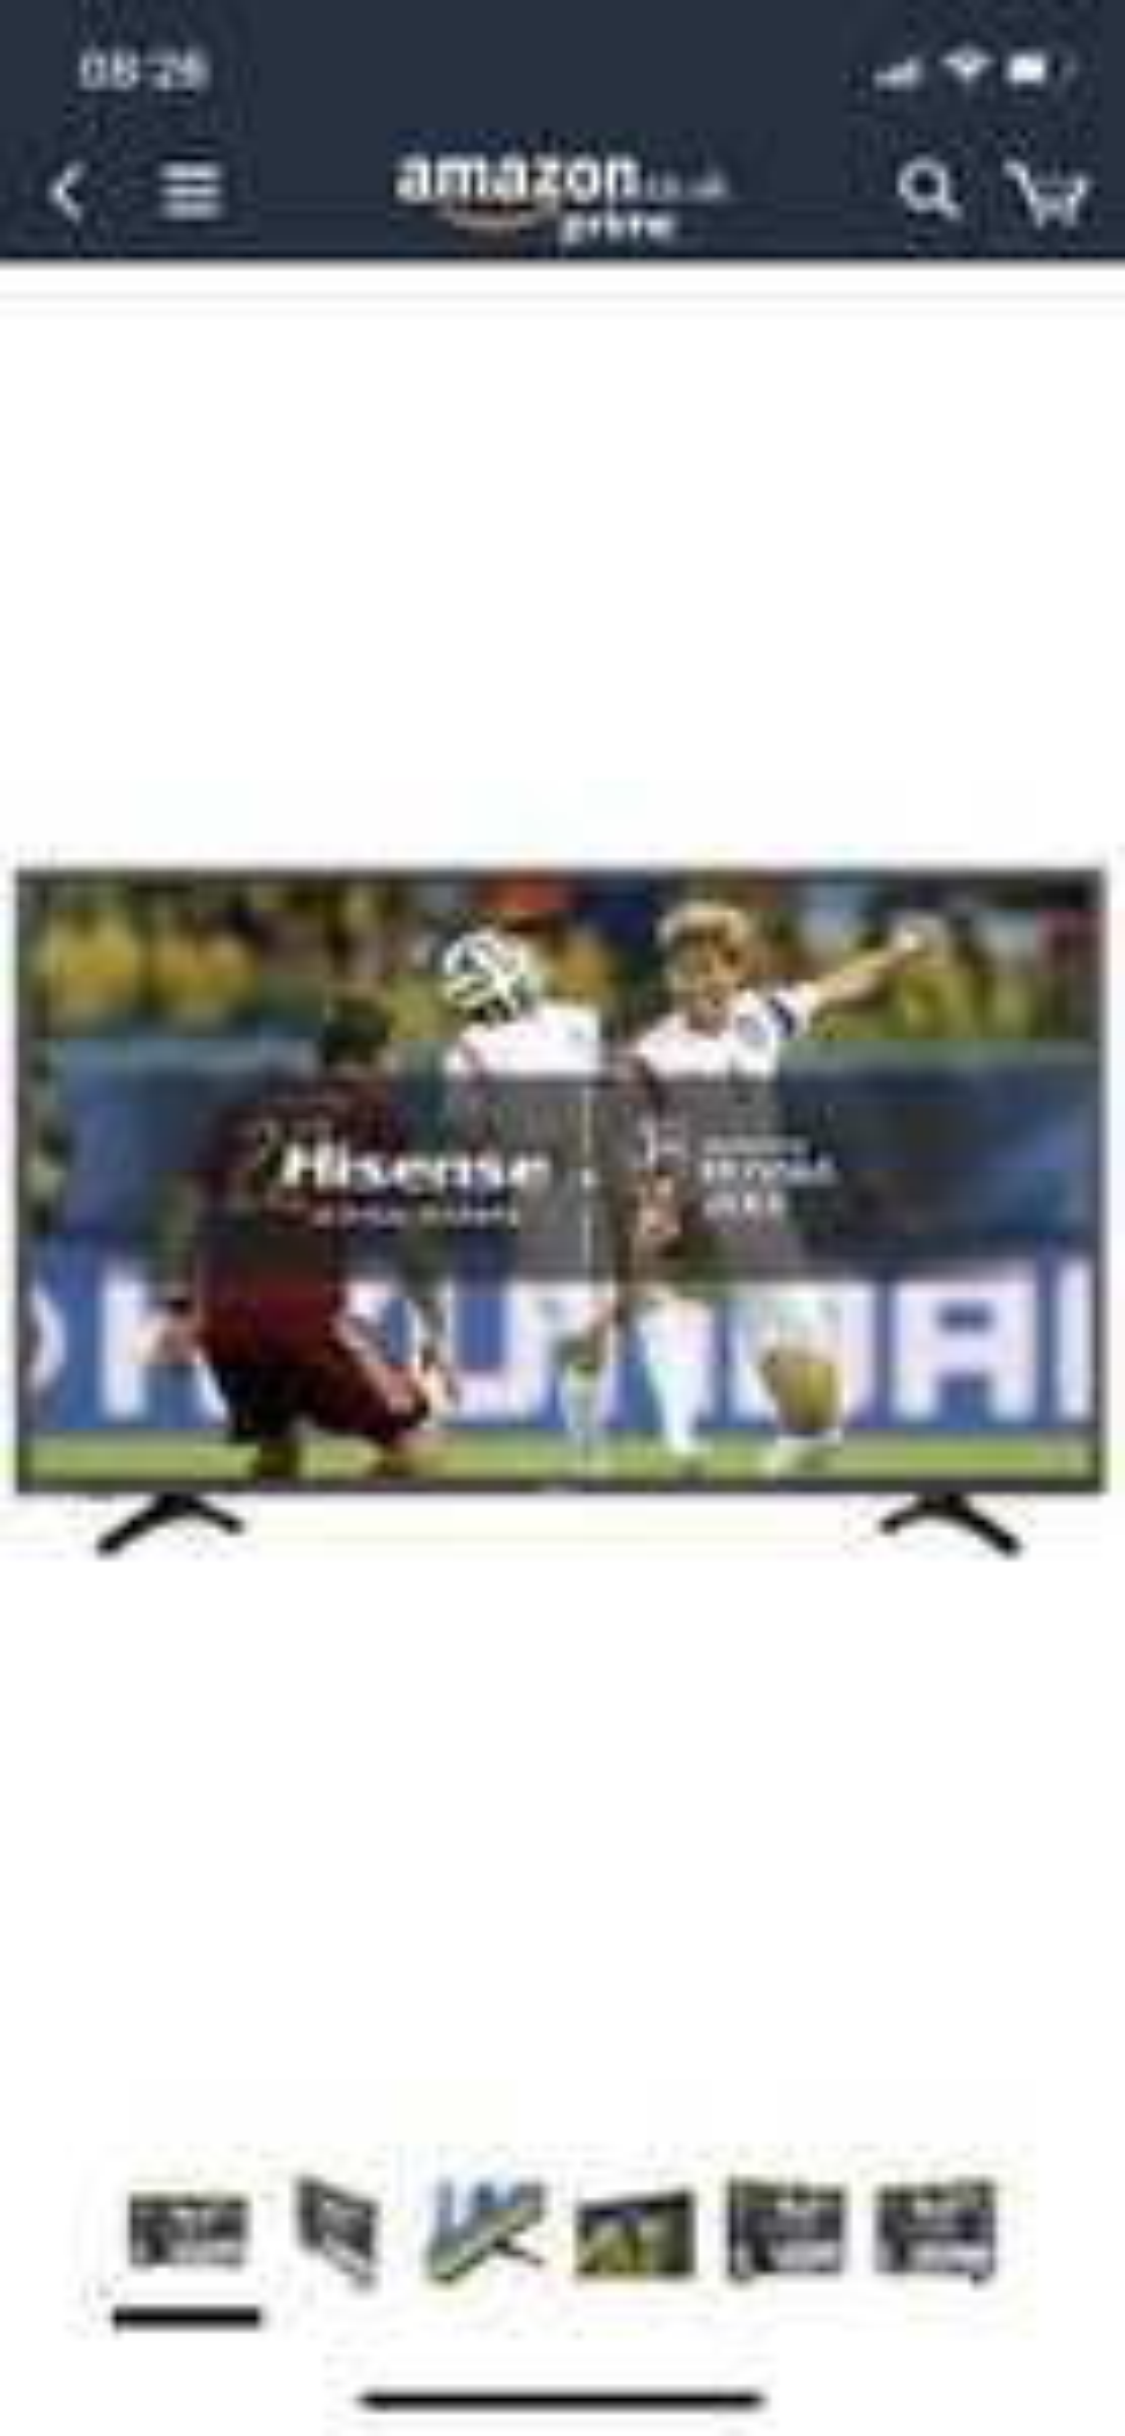 Hisense H43N5500UK 43inch 4K UHD Smart TV - Black (2017 Model) £260.66 Amazon